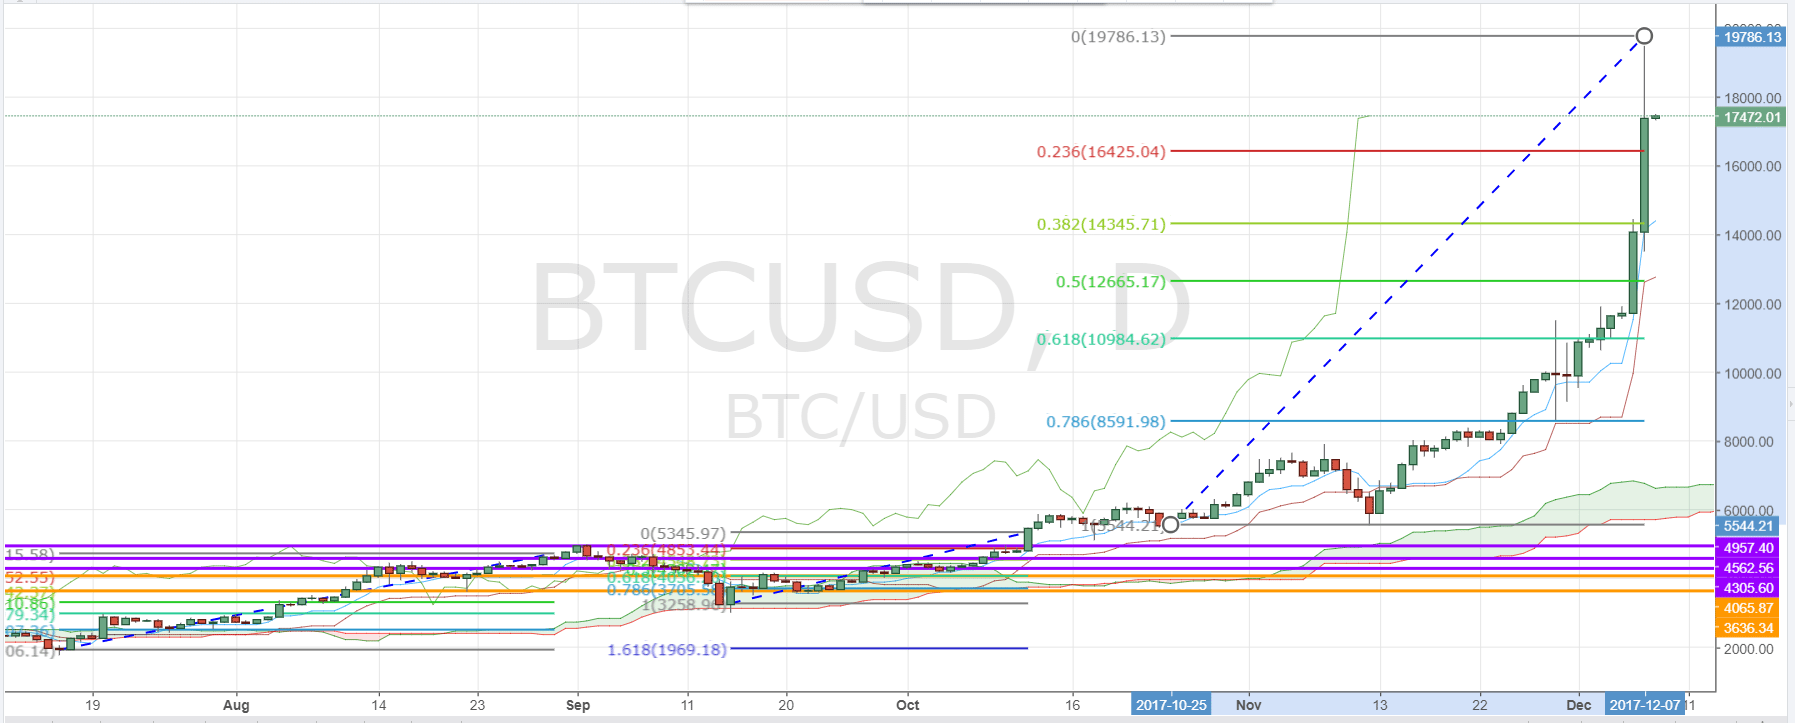 bitcoin price chart market cap